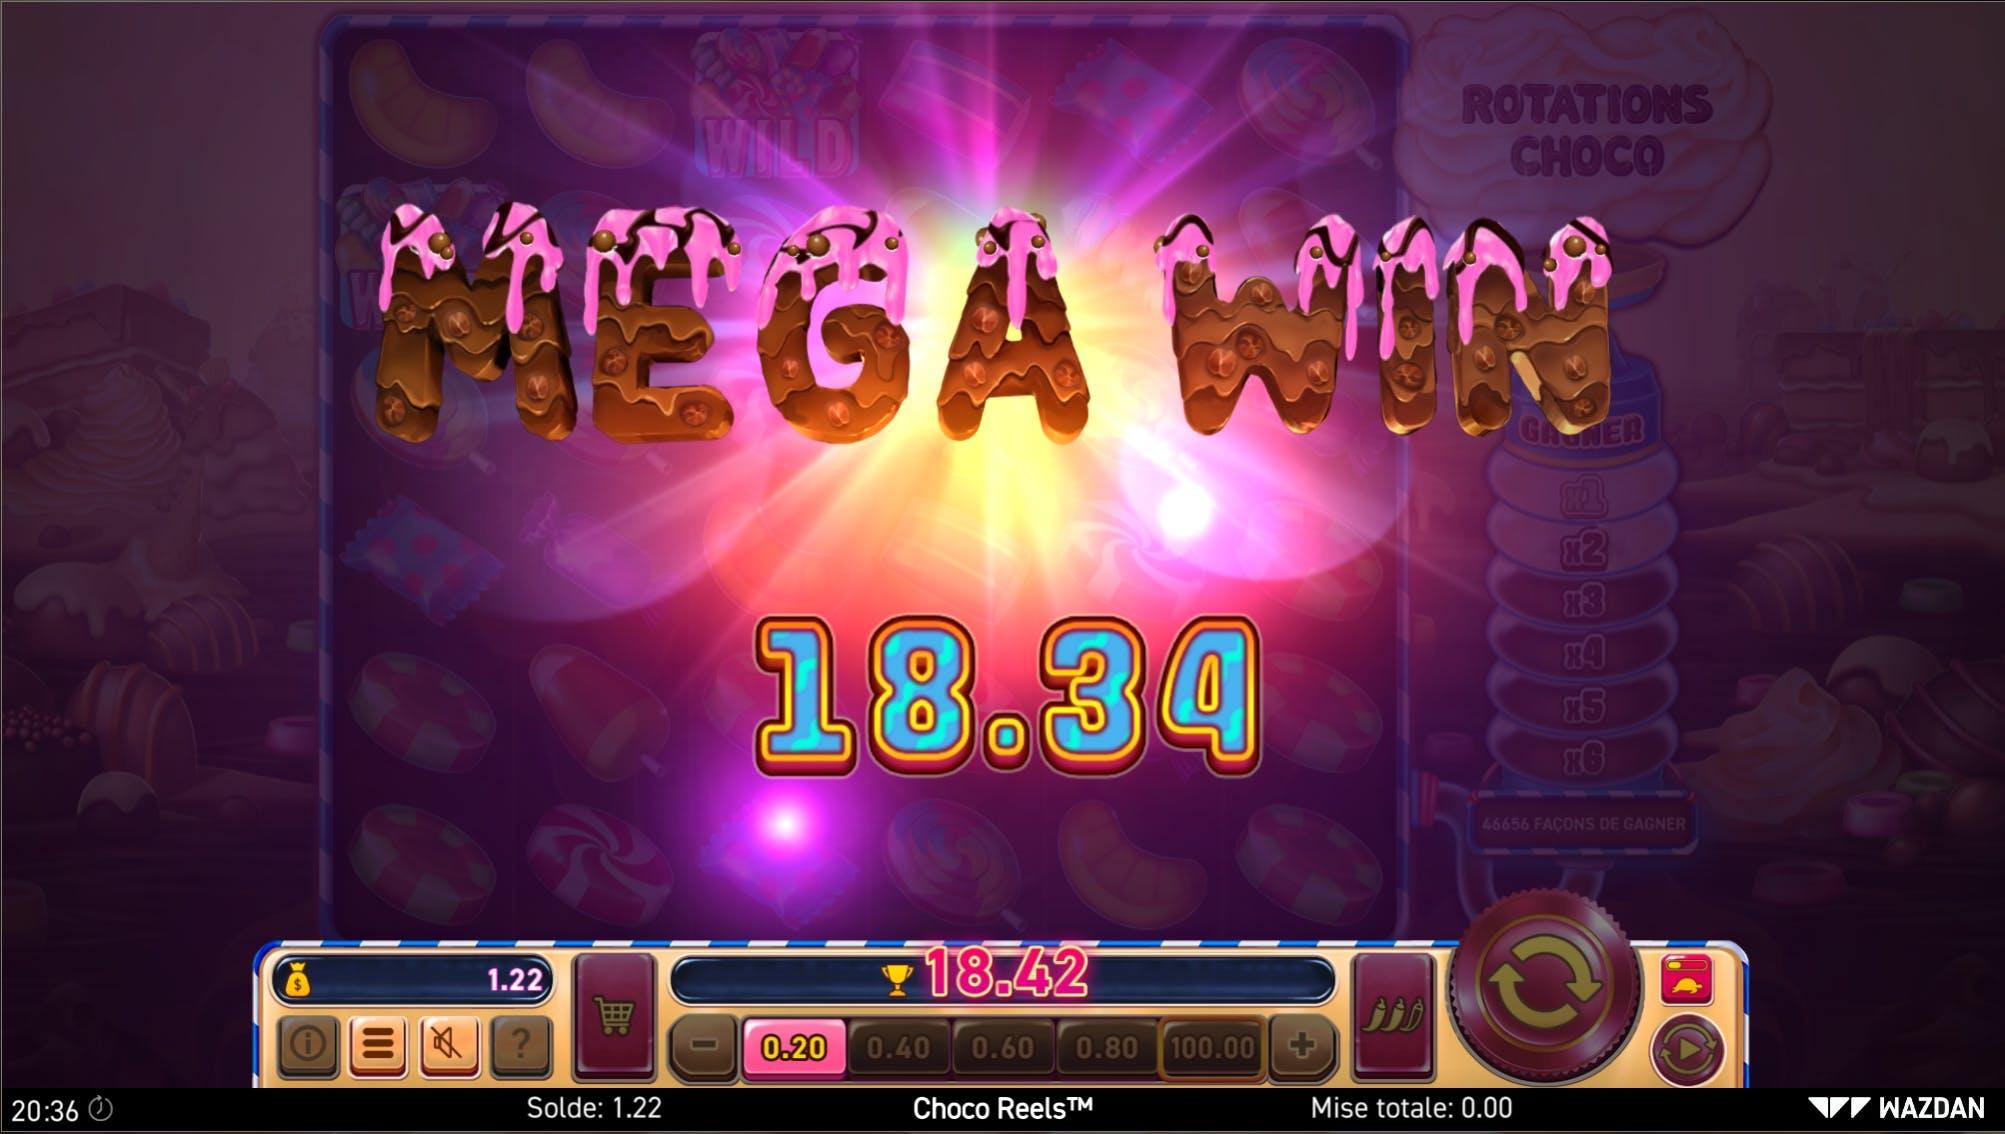 Mega Win on choco reels from Wazdan